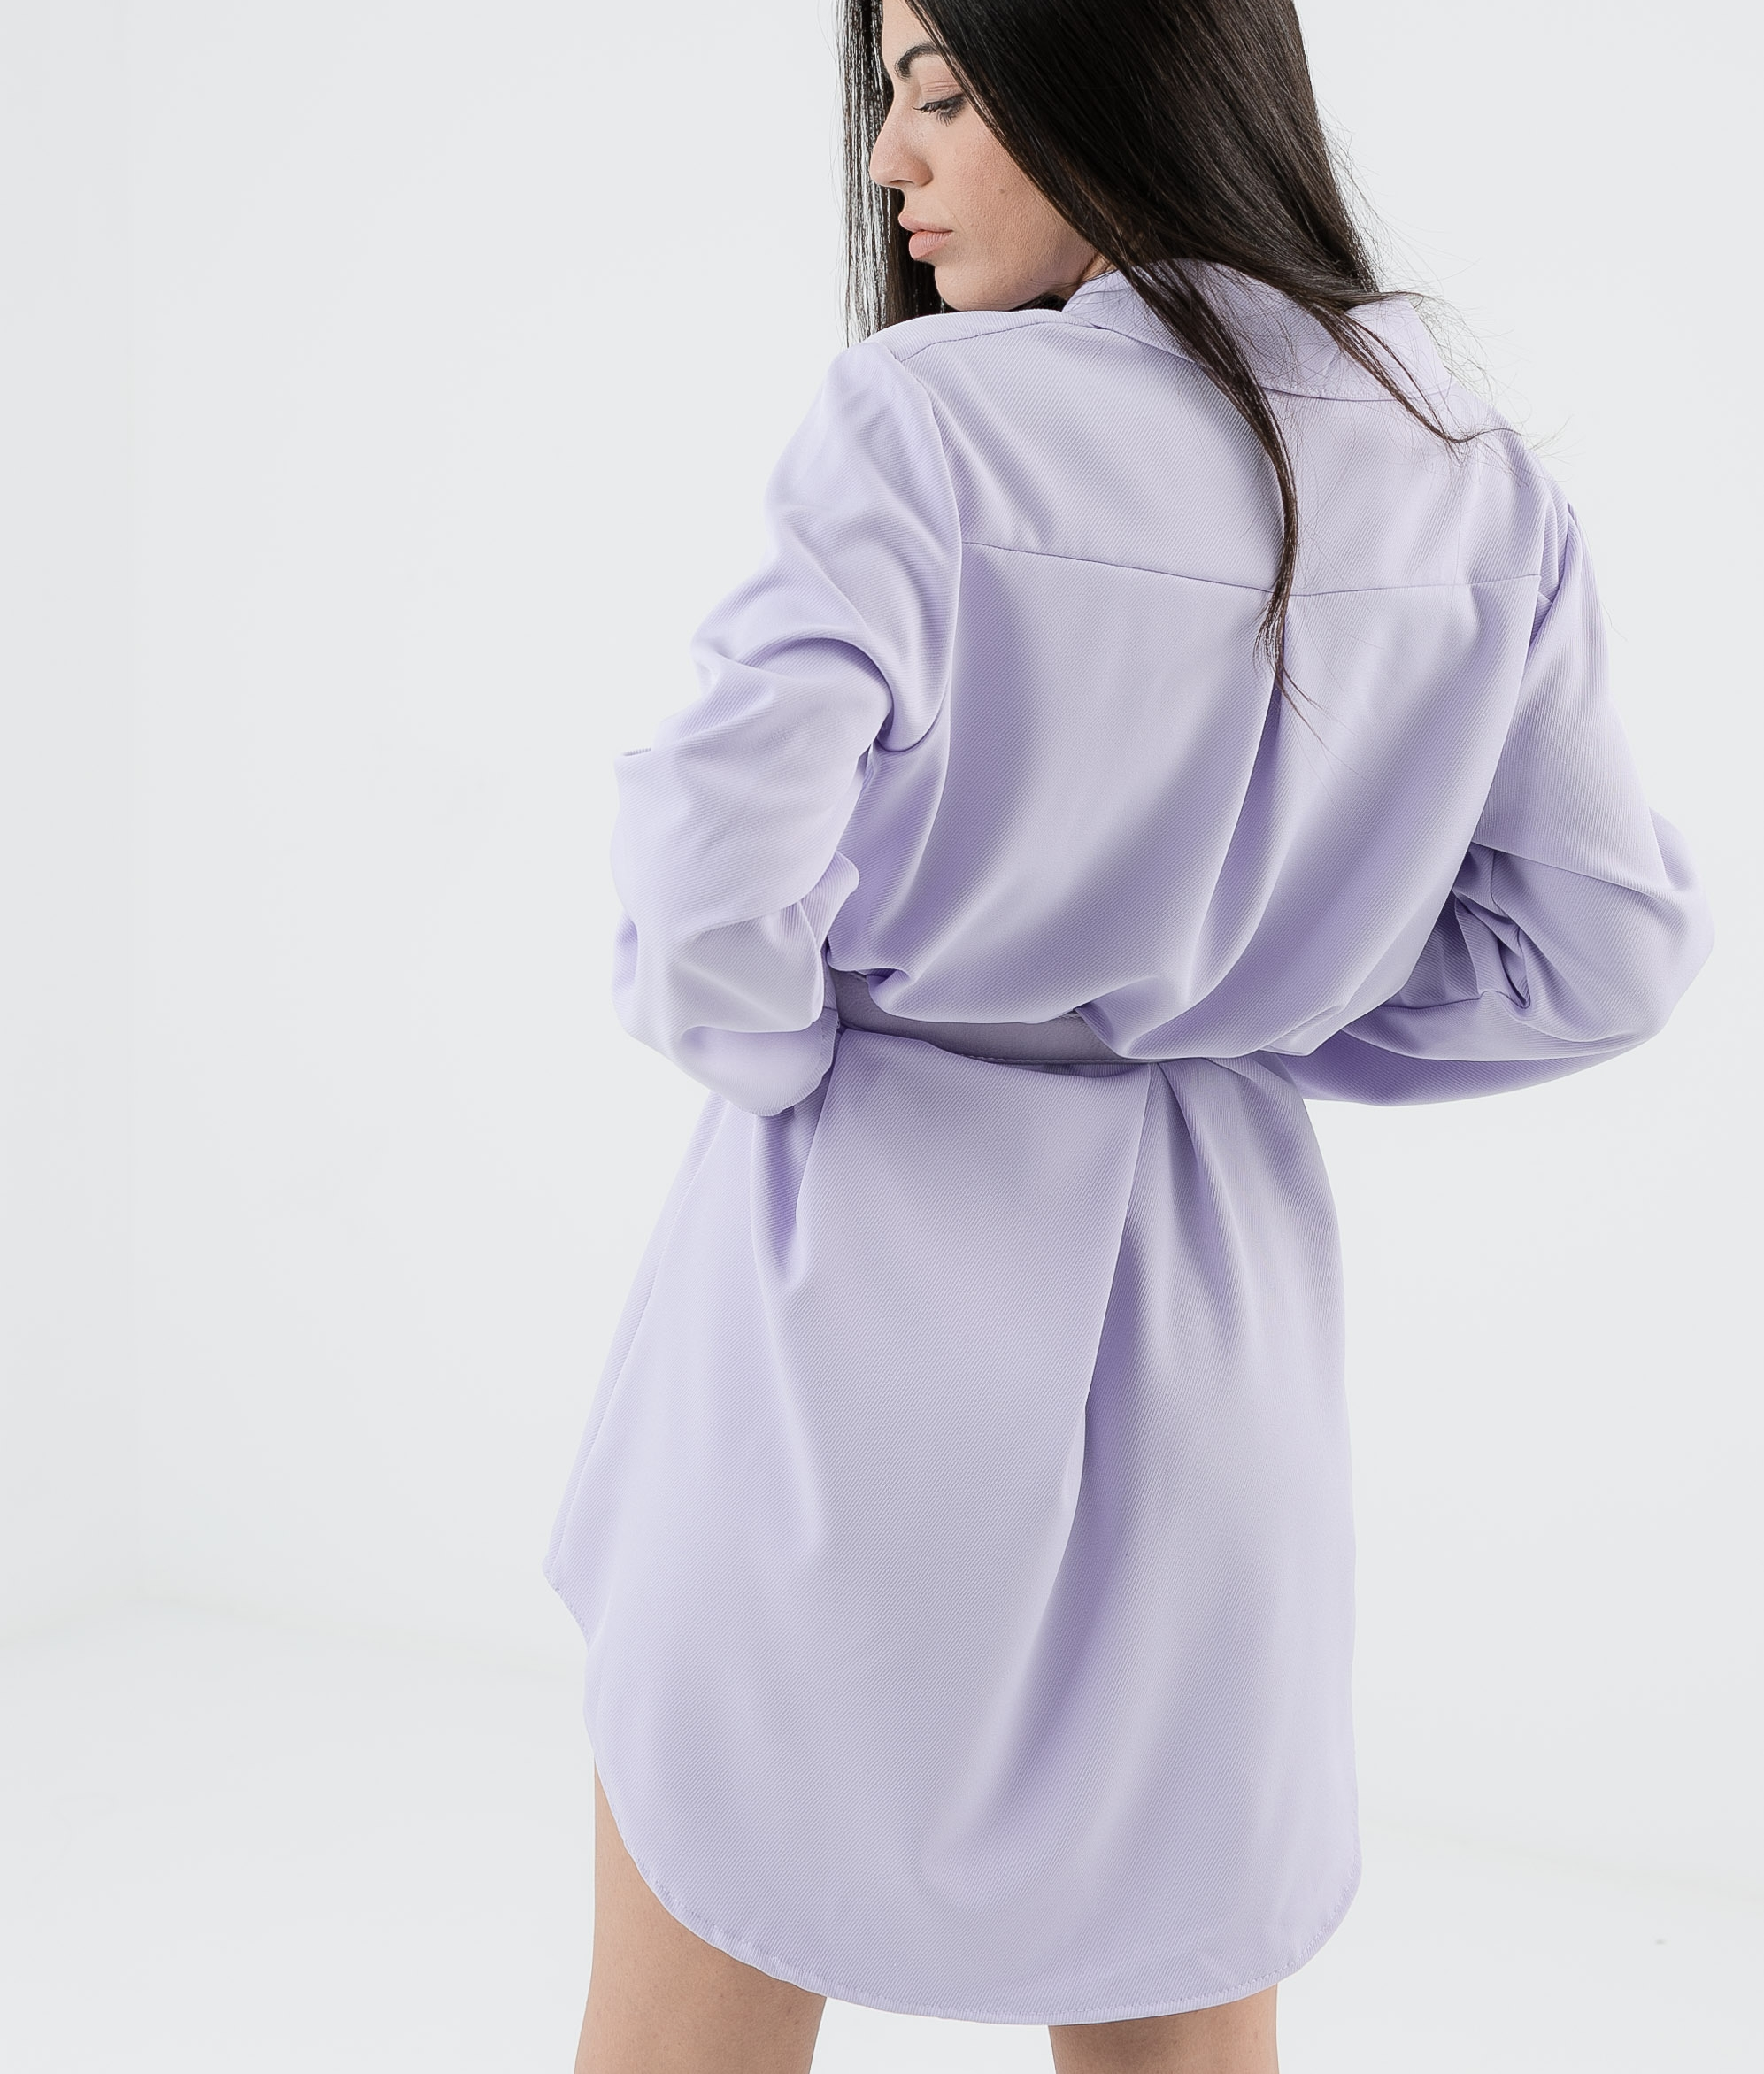 RIVEL DRESS - PURPLE